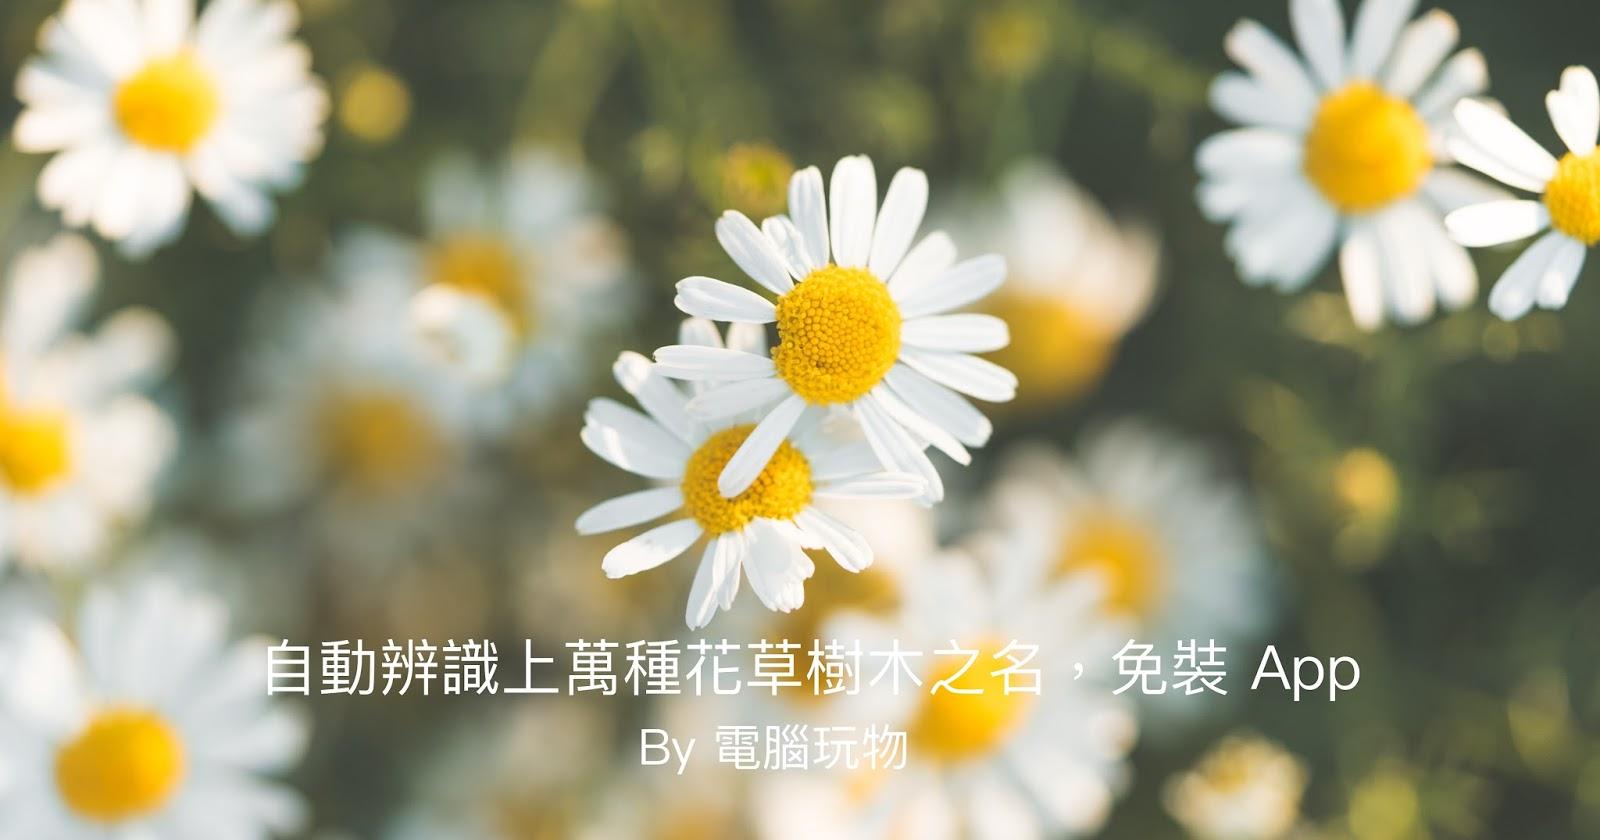 Pl@ntNet 自動辨識花卉植物名稱,只需上傳野生花草樹木照片